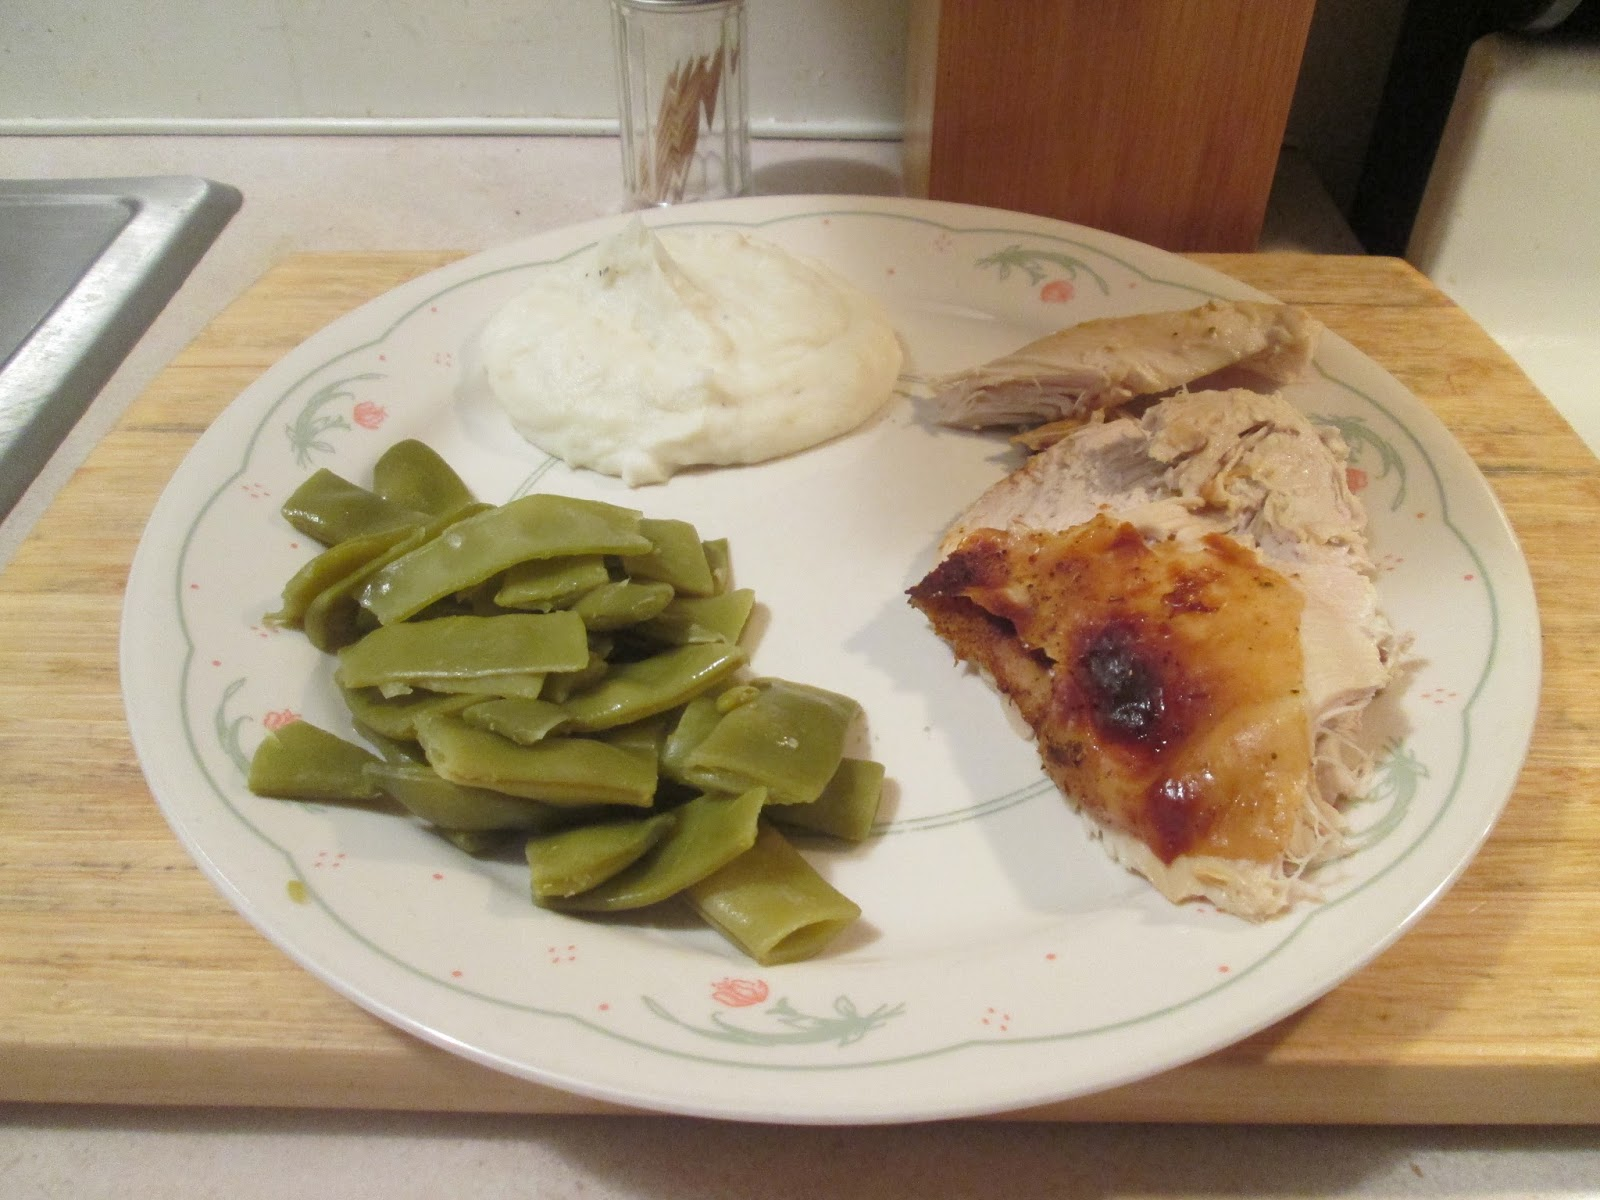 Diab2cook Jennie O Oven Ready Boneless Skinless Turkey Breast W